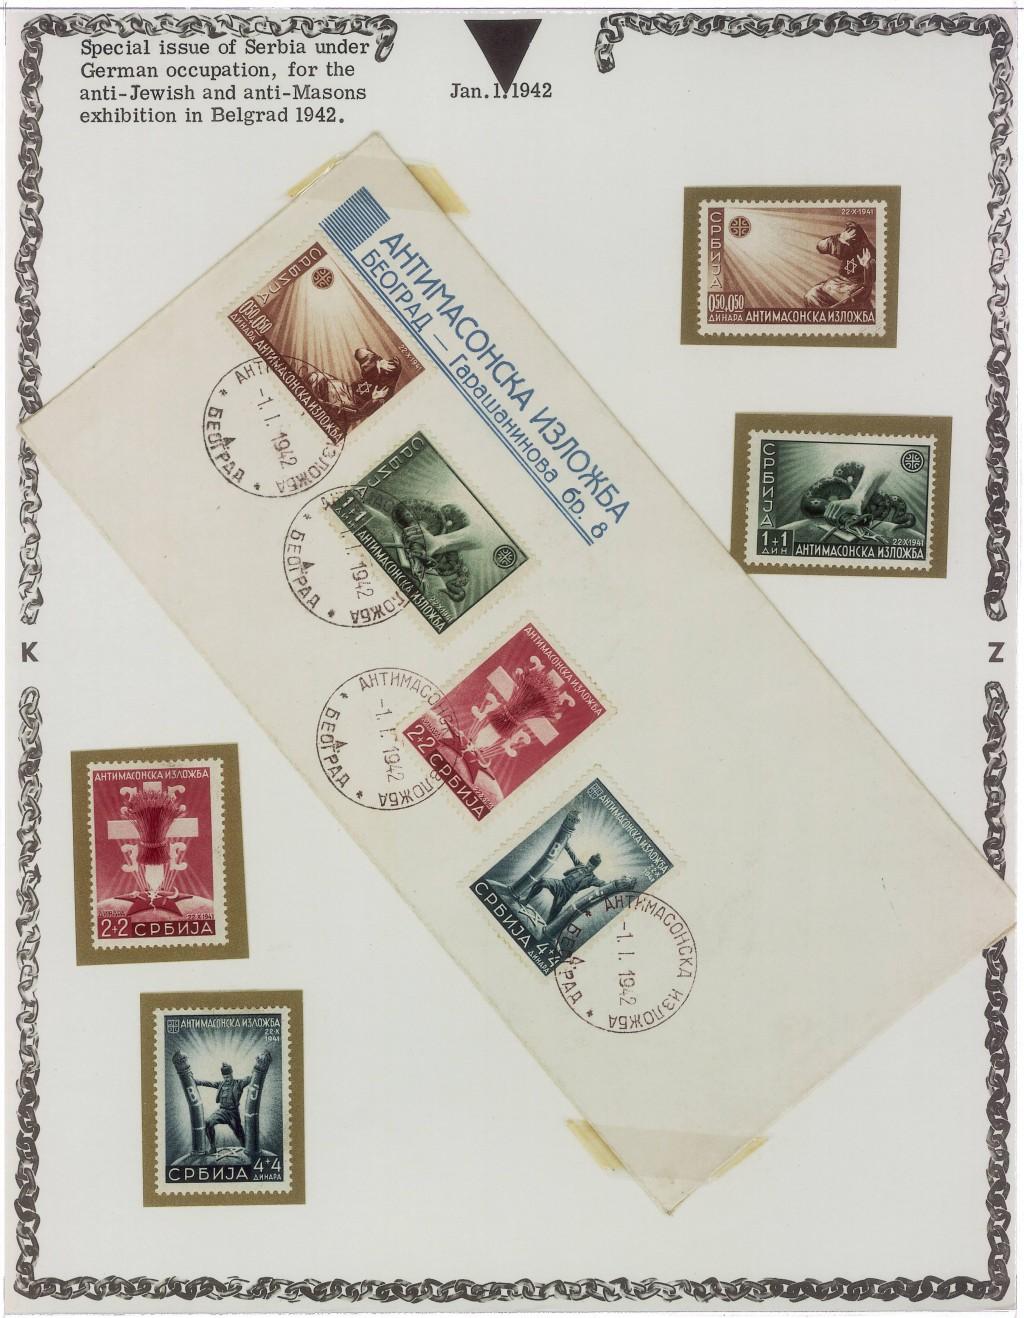 Stamps [LCID: 200679yl]